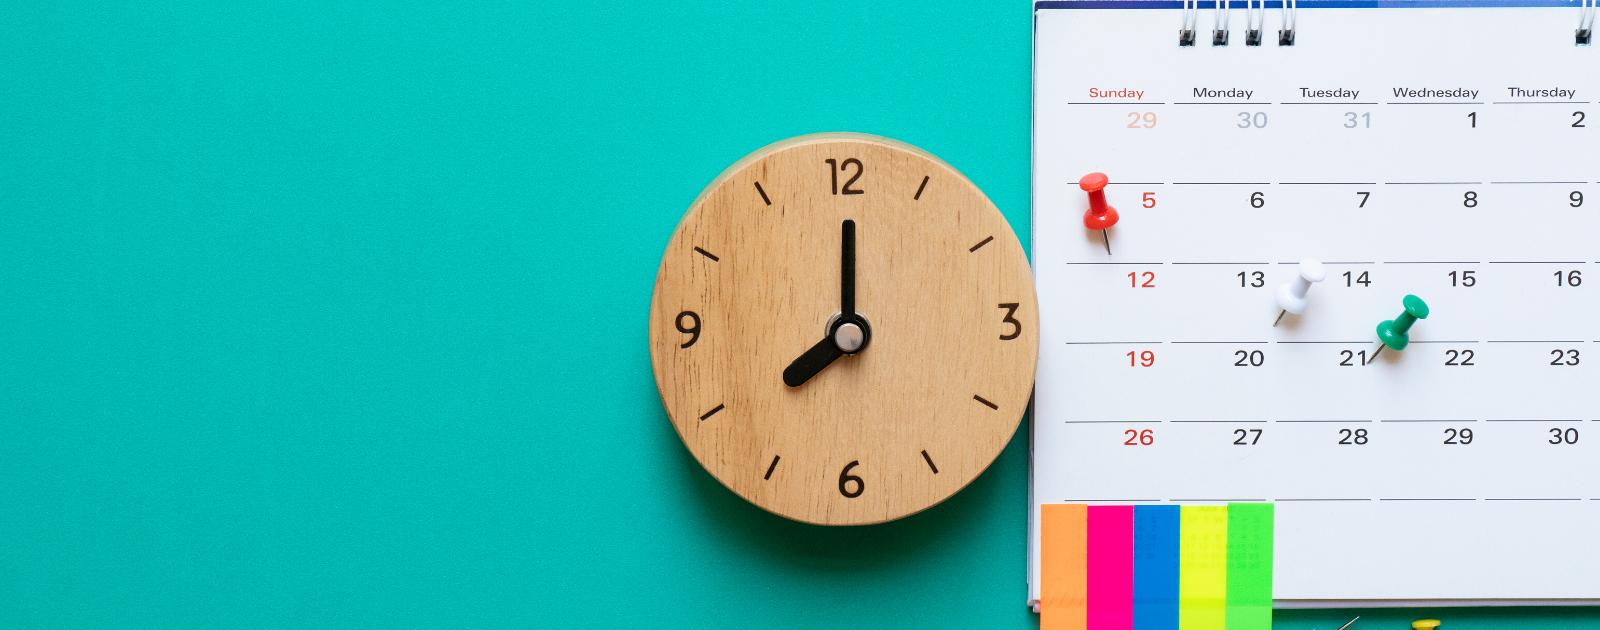 Overcoming the Potholes of Procrastination